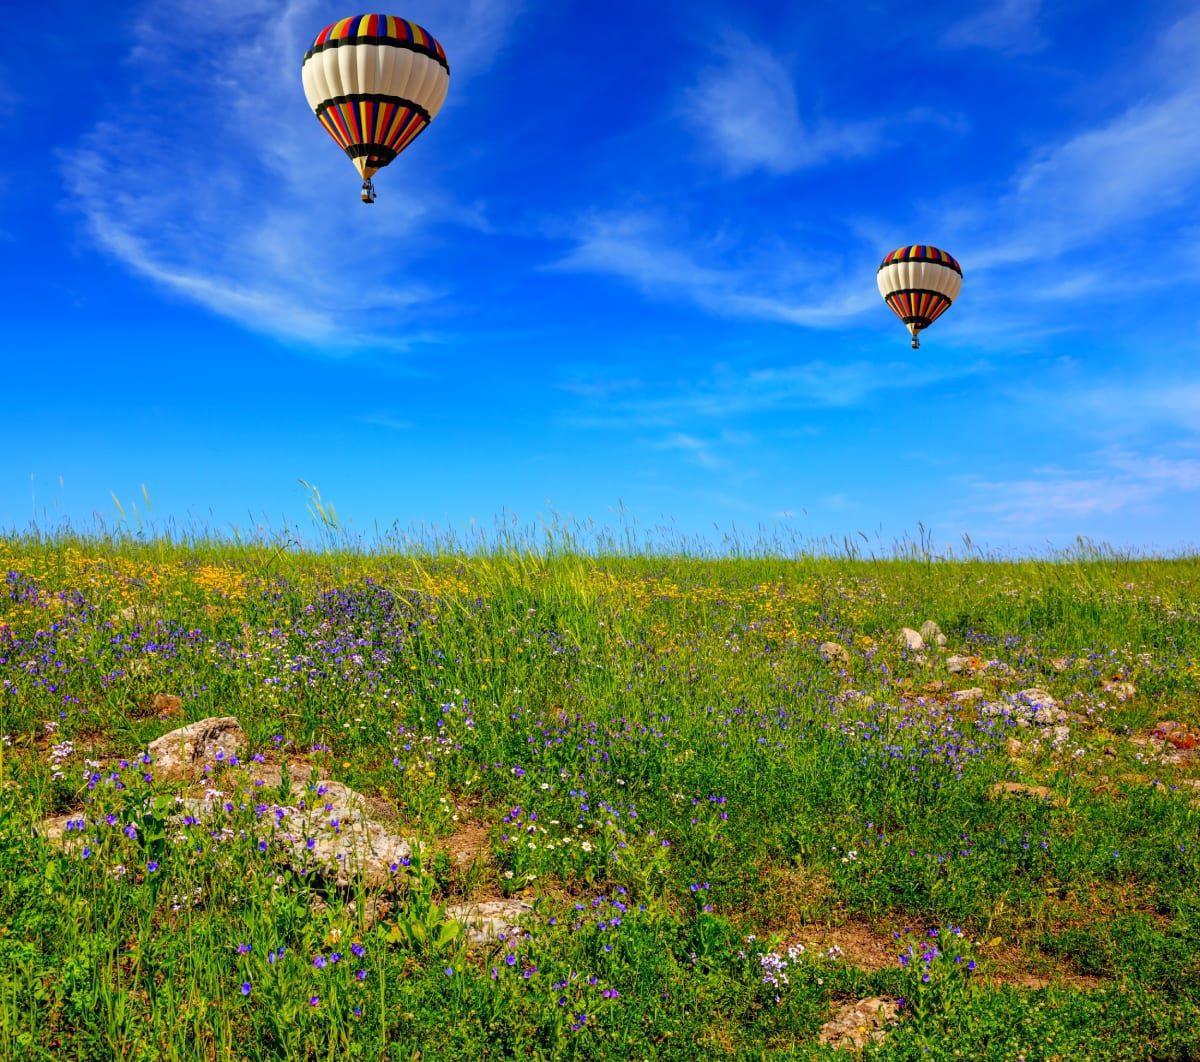 Hot Air Balloons in Israel